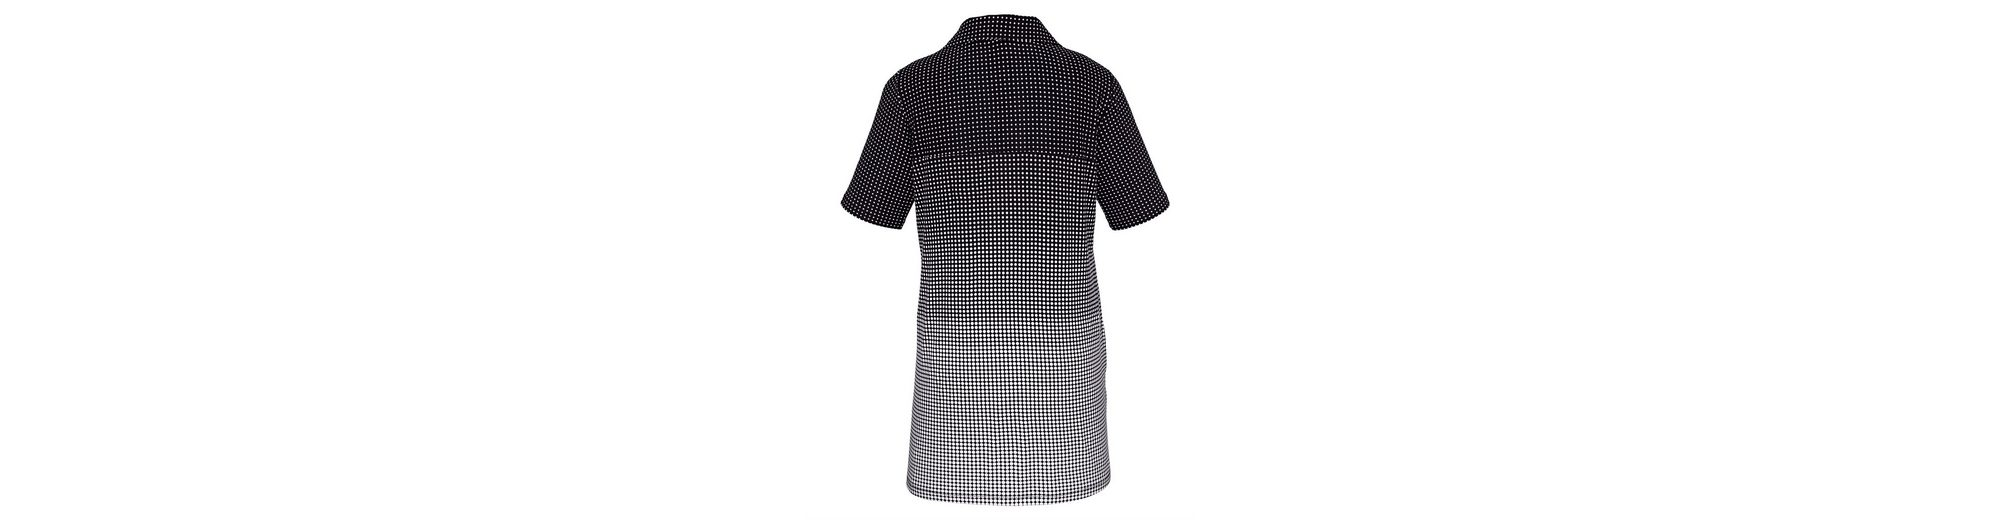 MIAMODA Longshirt mit Farbverlauf Wie Viel Zum Verkauf Finish ZG5NVNbxUv